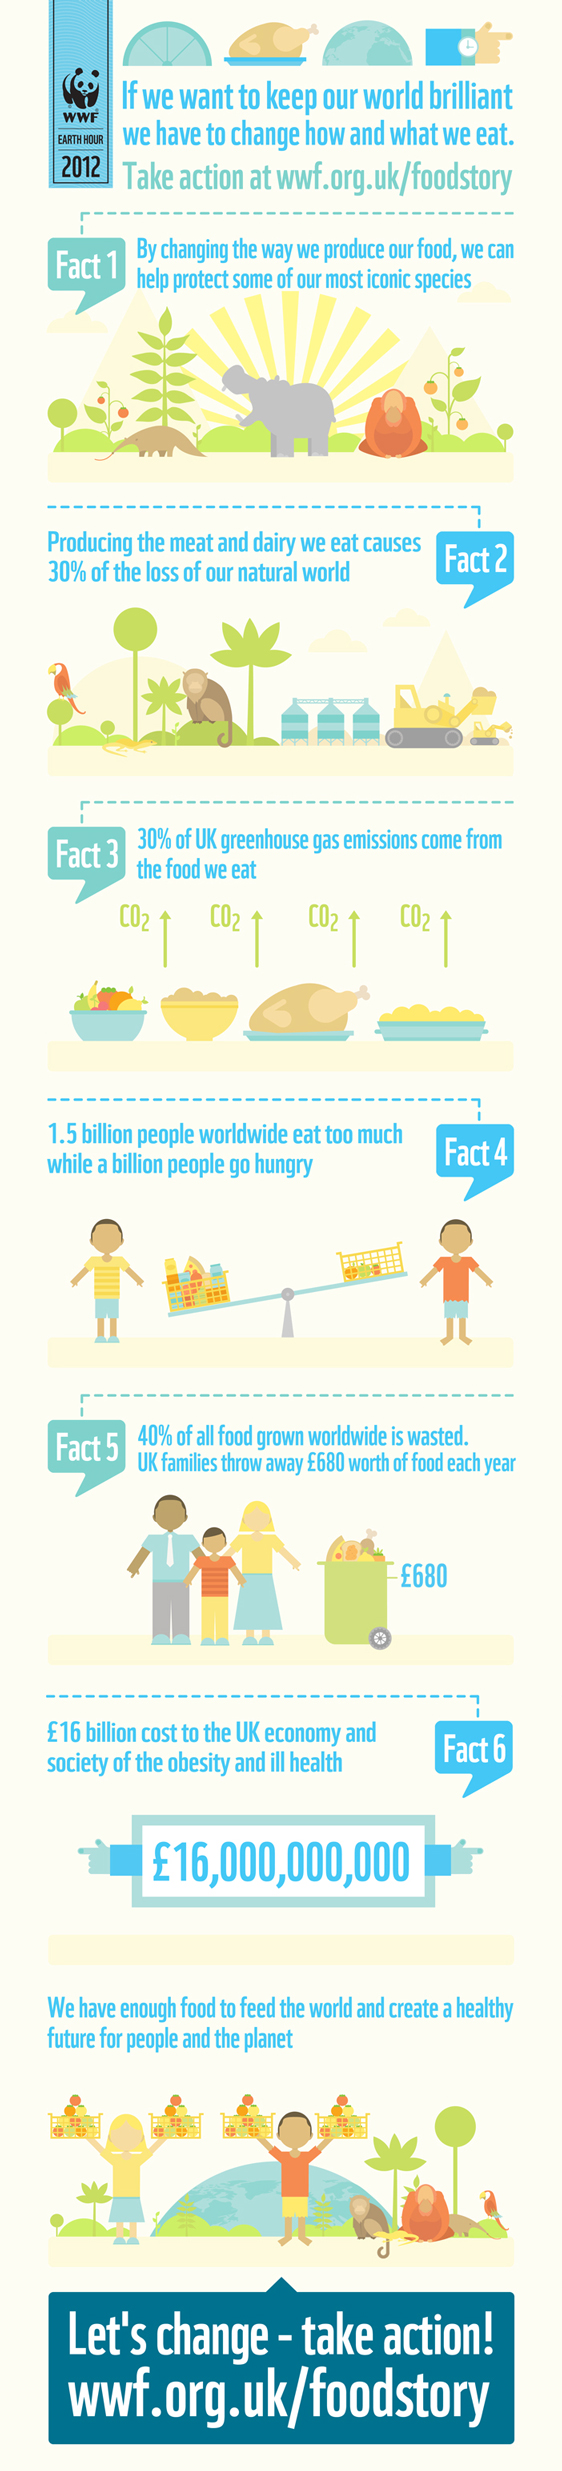 Take action at wwf.org.uk/foodstory/